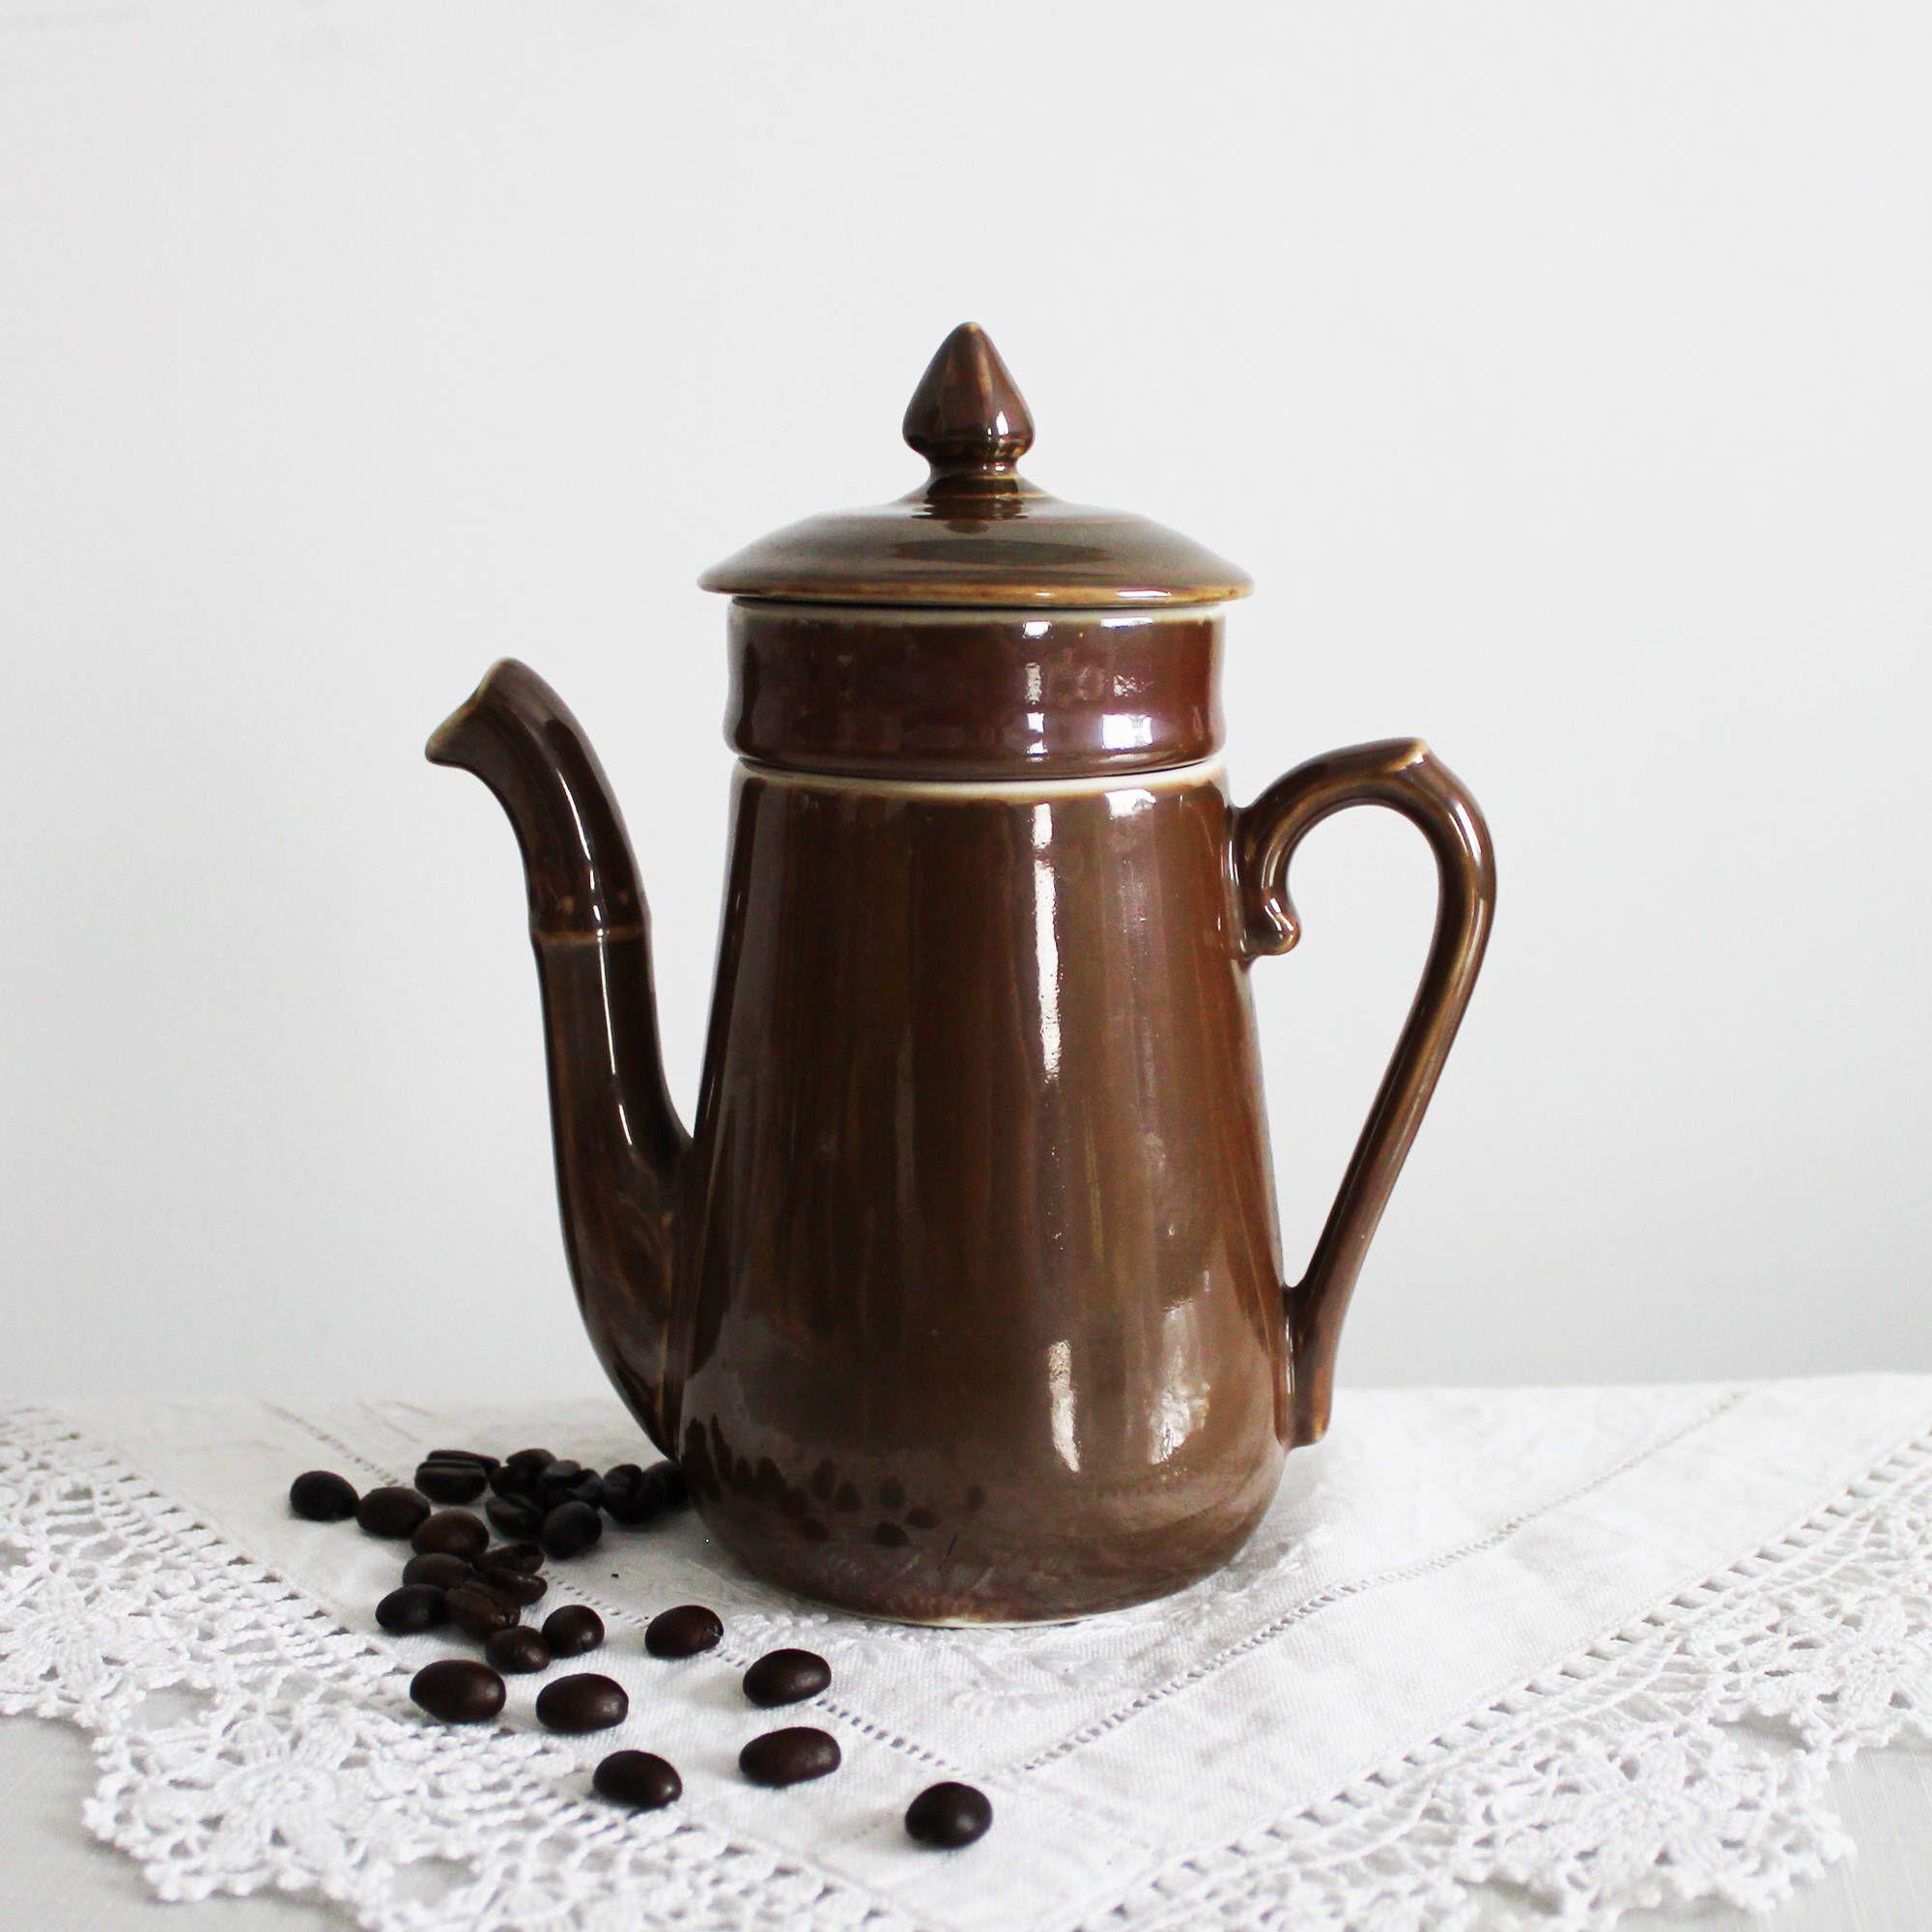 Vintage French chocolate pot ceramic brown teapot retro coffee pot jug mid-century Small ceramic tea pot tableware tea party cottage decor & Vintage French chocolate pot ceramic brown teapot retro coffee pot ...